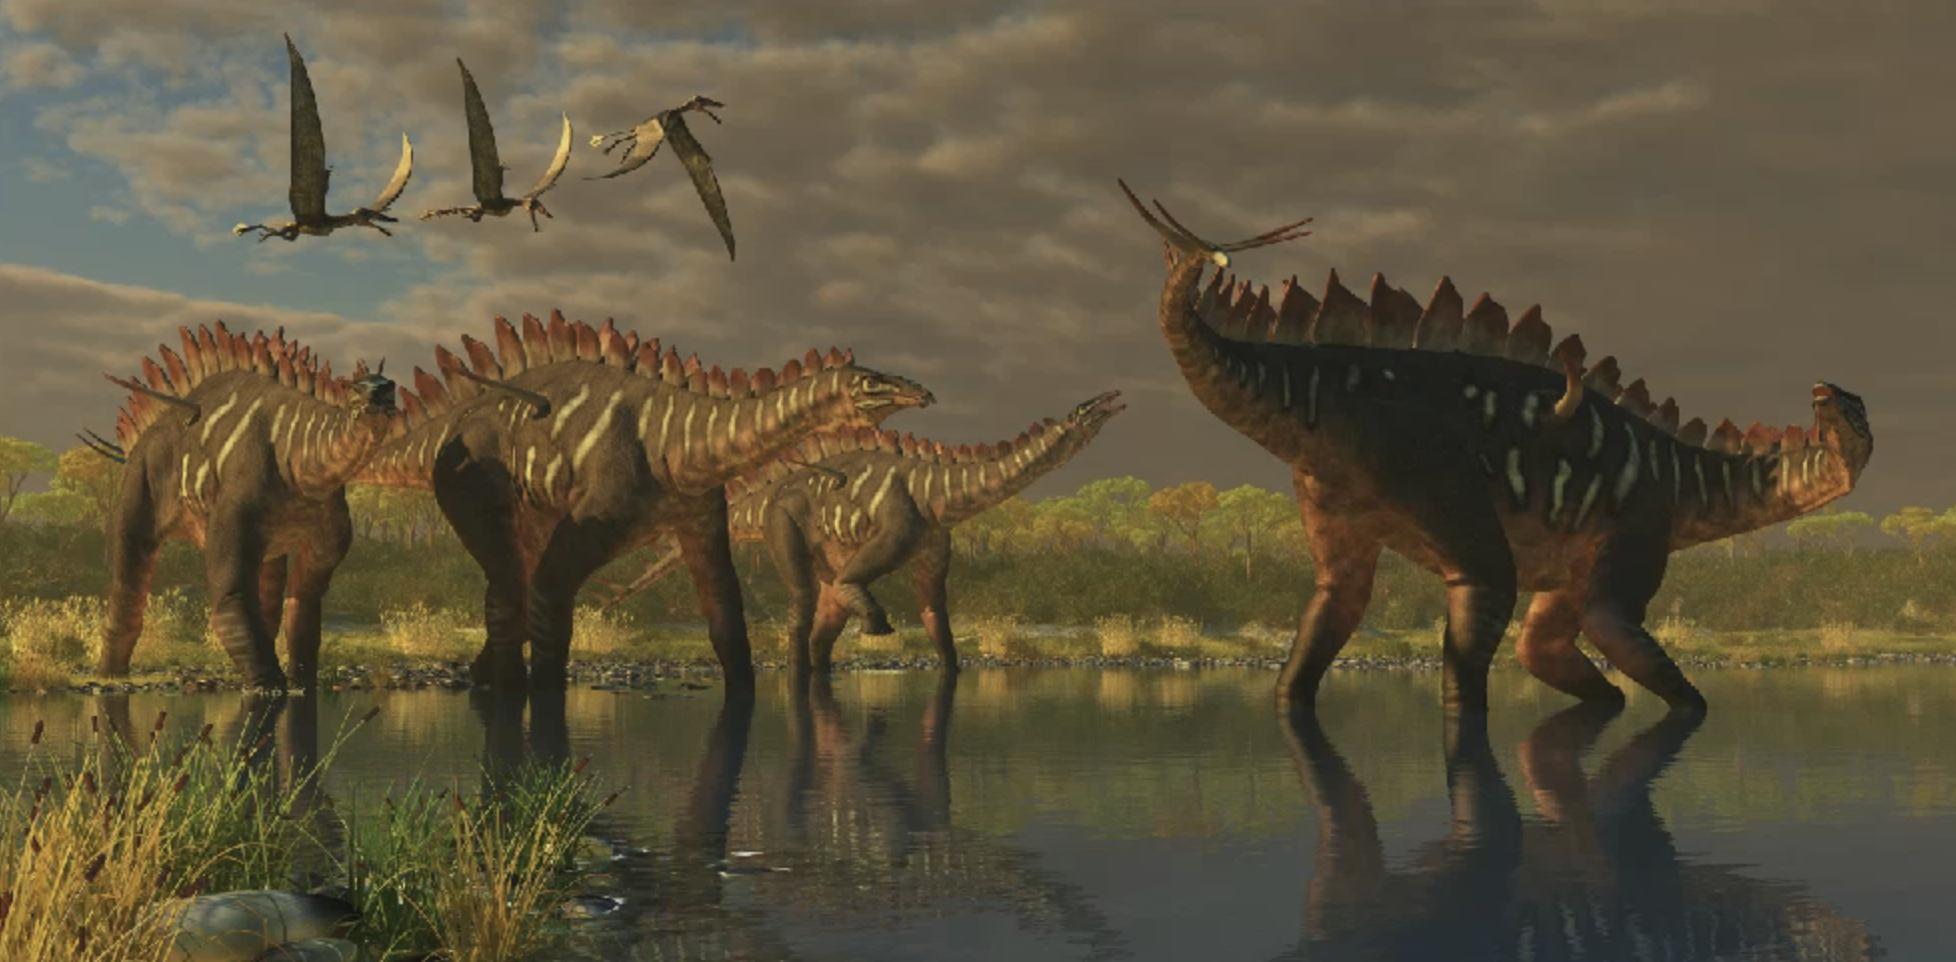 Scotland's 'Jurassic' fossils among world's richest